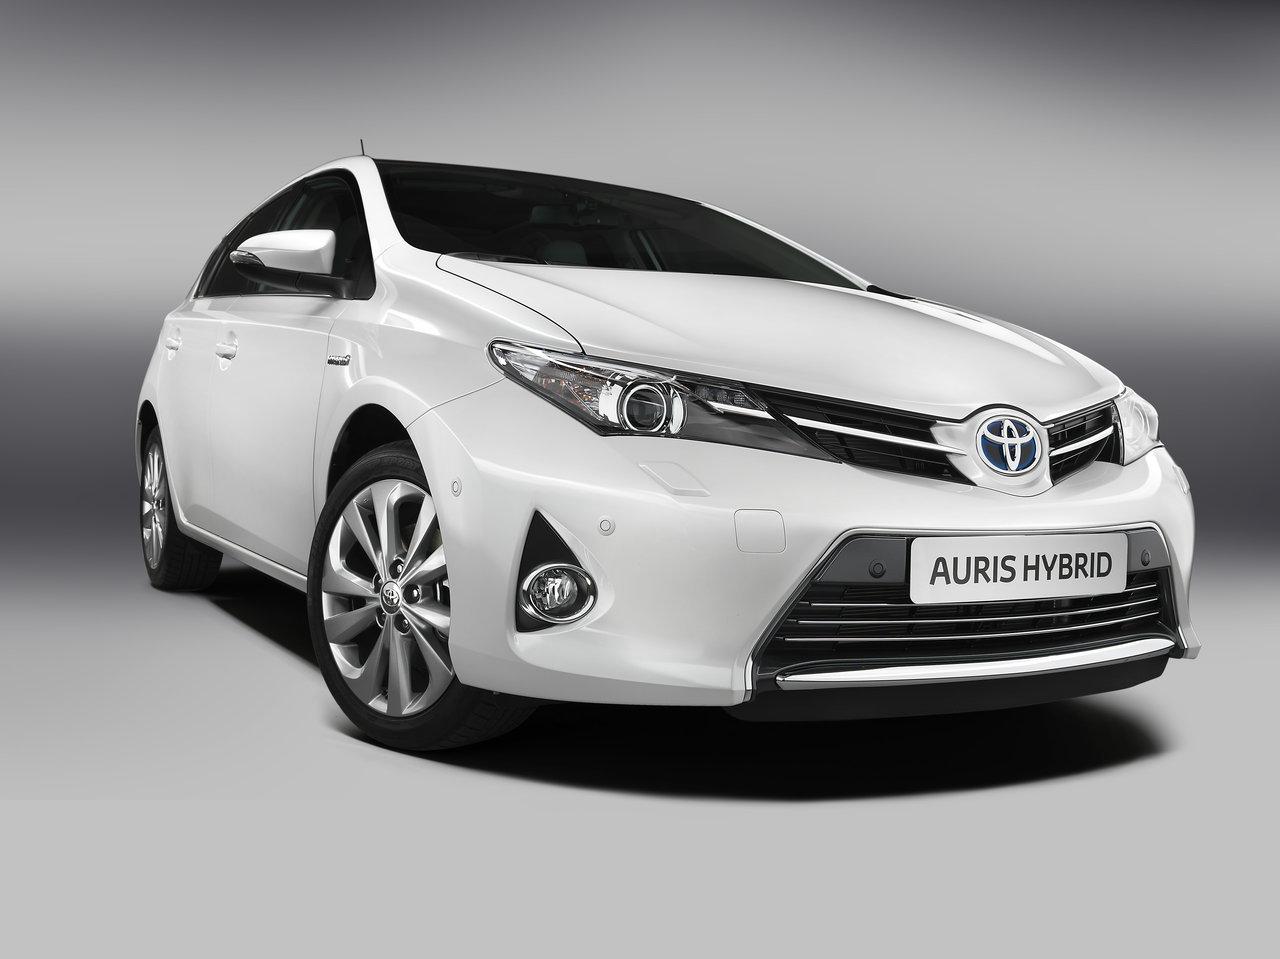 Foto de Toyota Auris Híbrido 2013 (1/8)